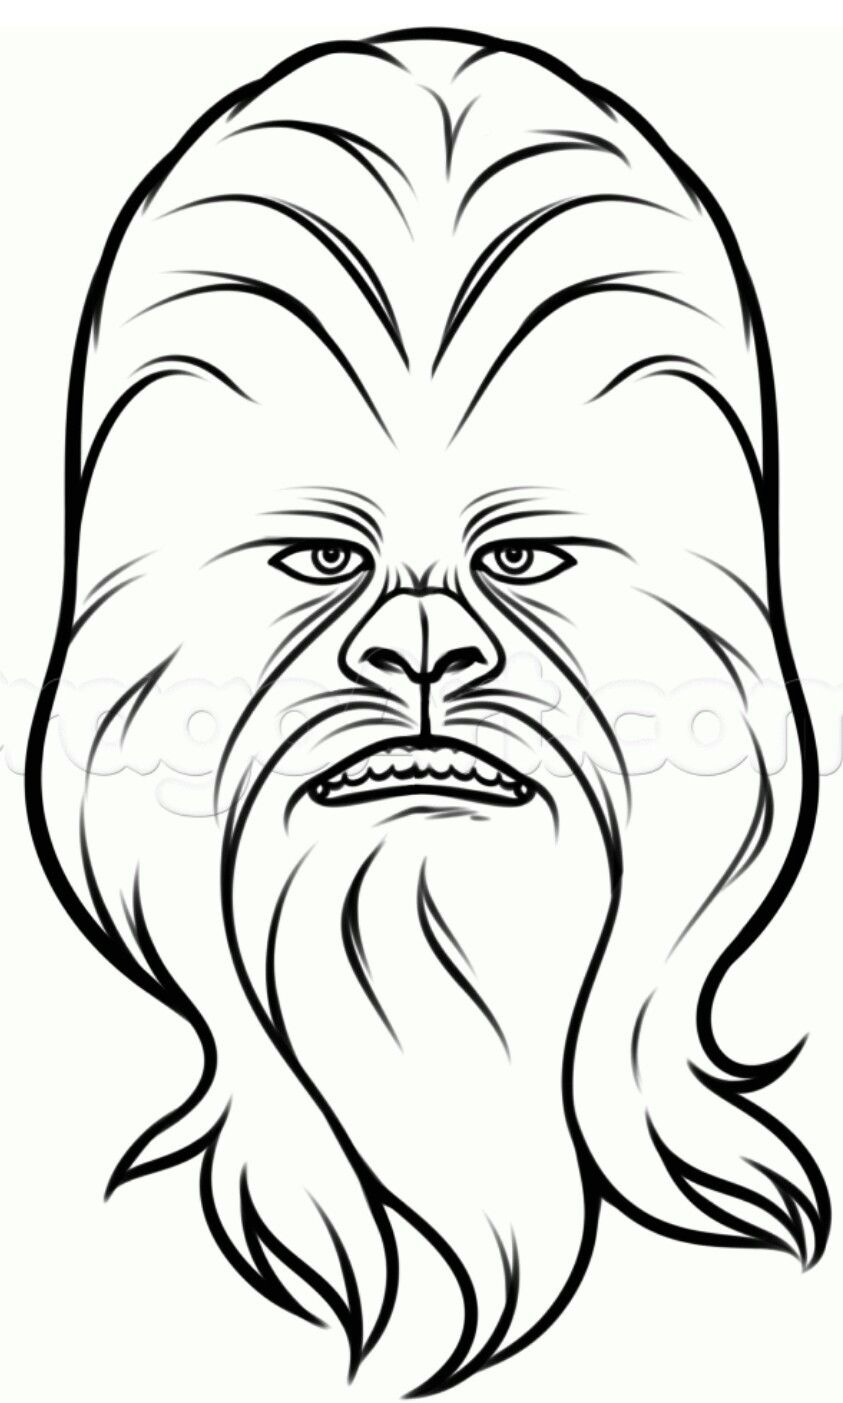 Chewbacca clipart black and white. Star wars tortas para